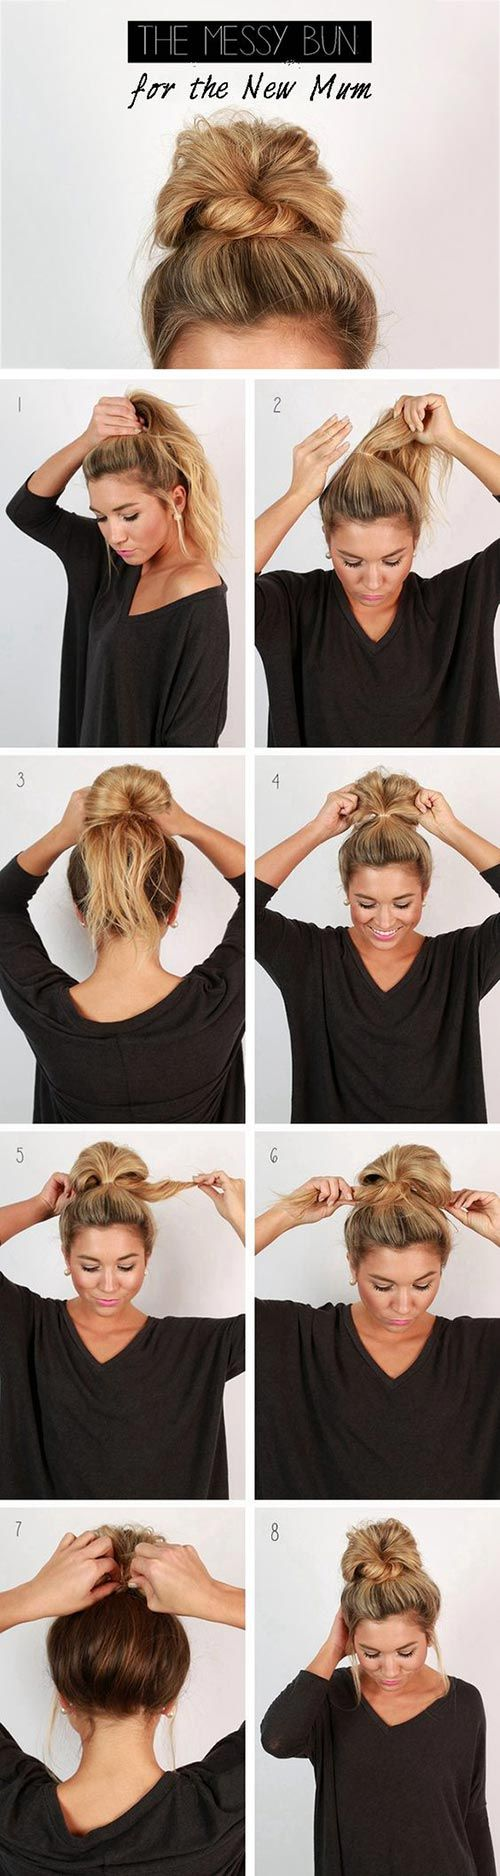 Top 10 Messy Updo Tutorials For Different Hair Lengths Frisuren